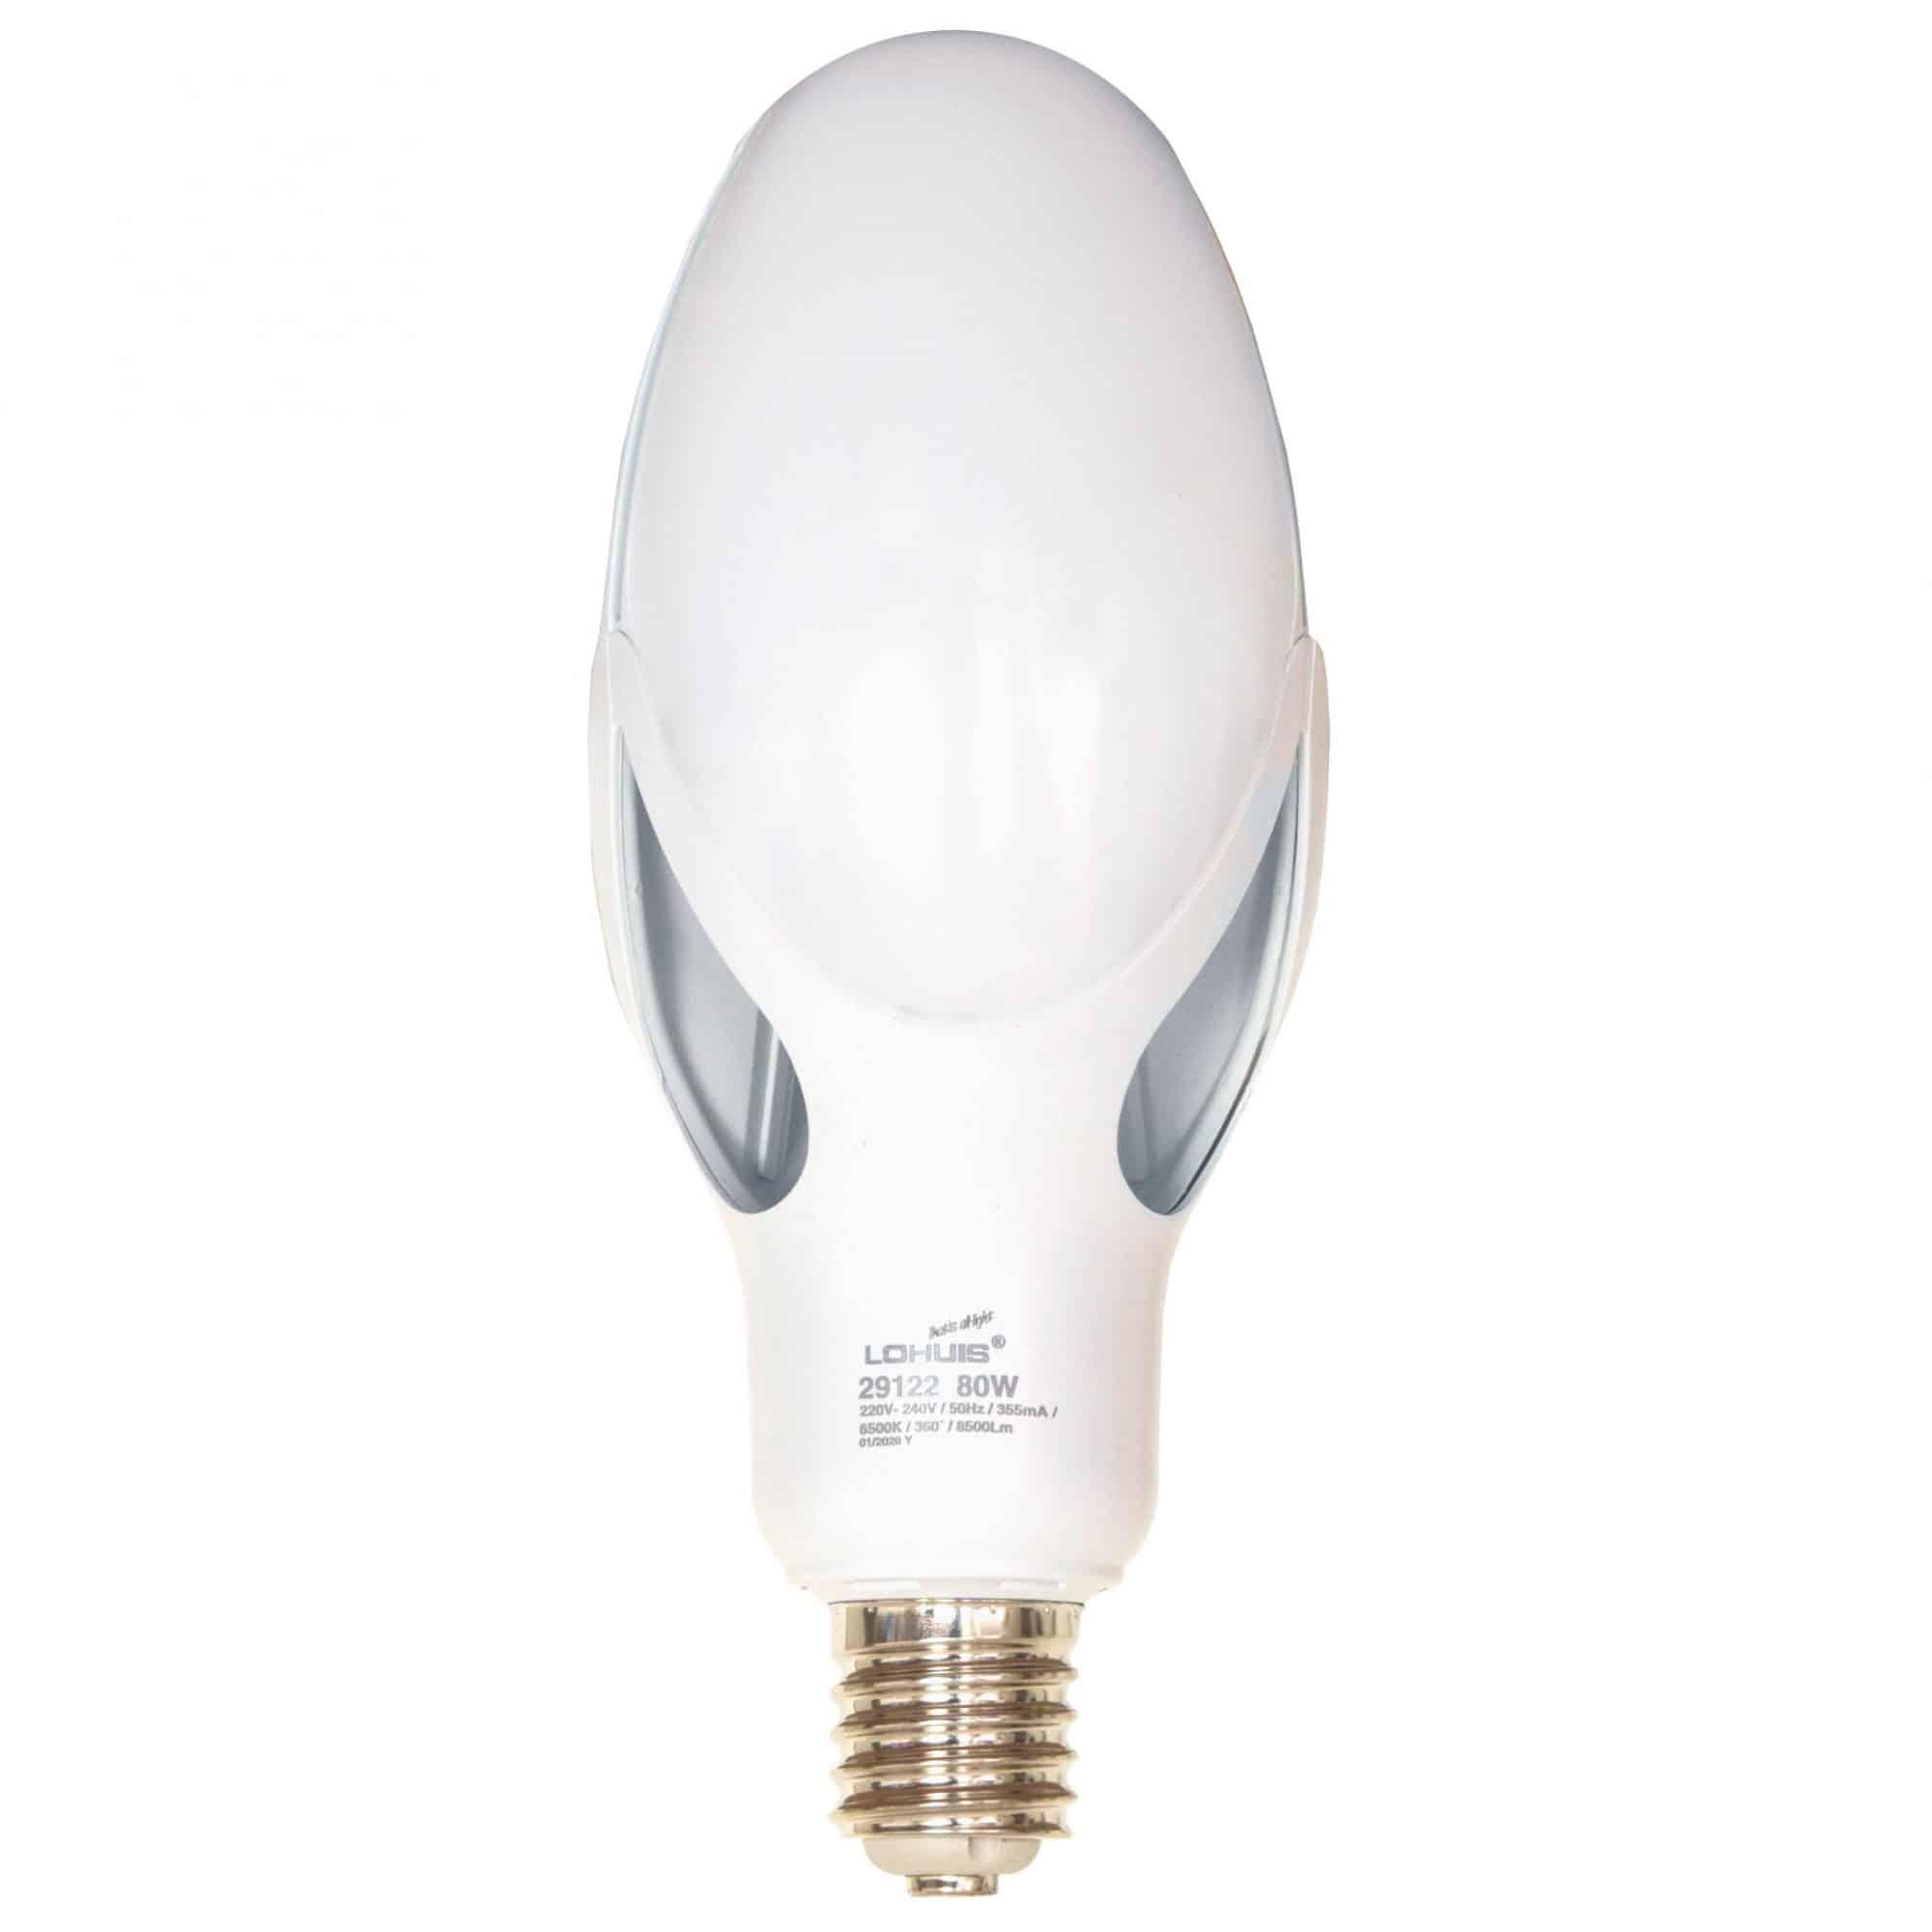 BEC LED FLOWER 80W E40 6500K LOHUIS mathaus 2021